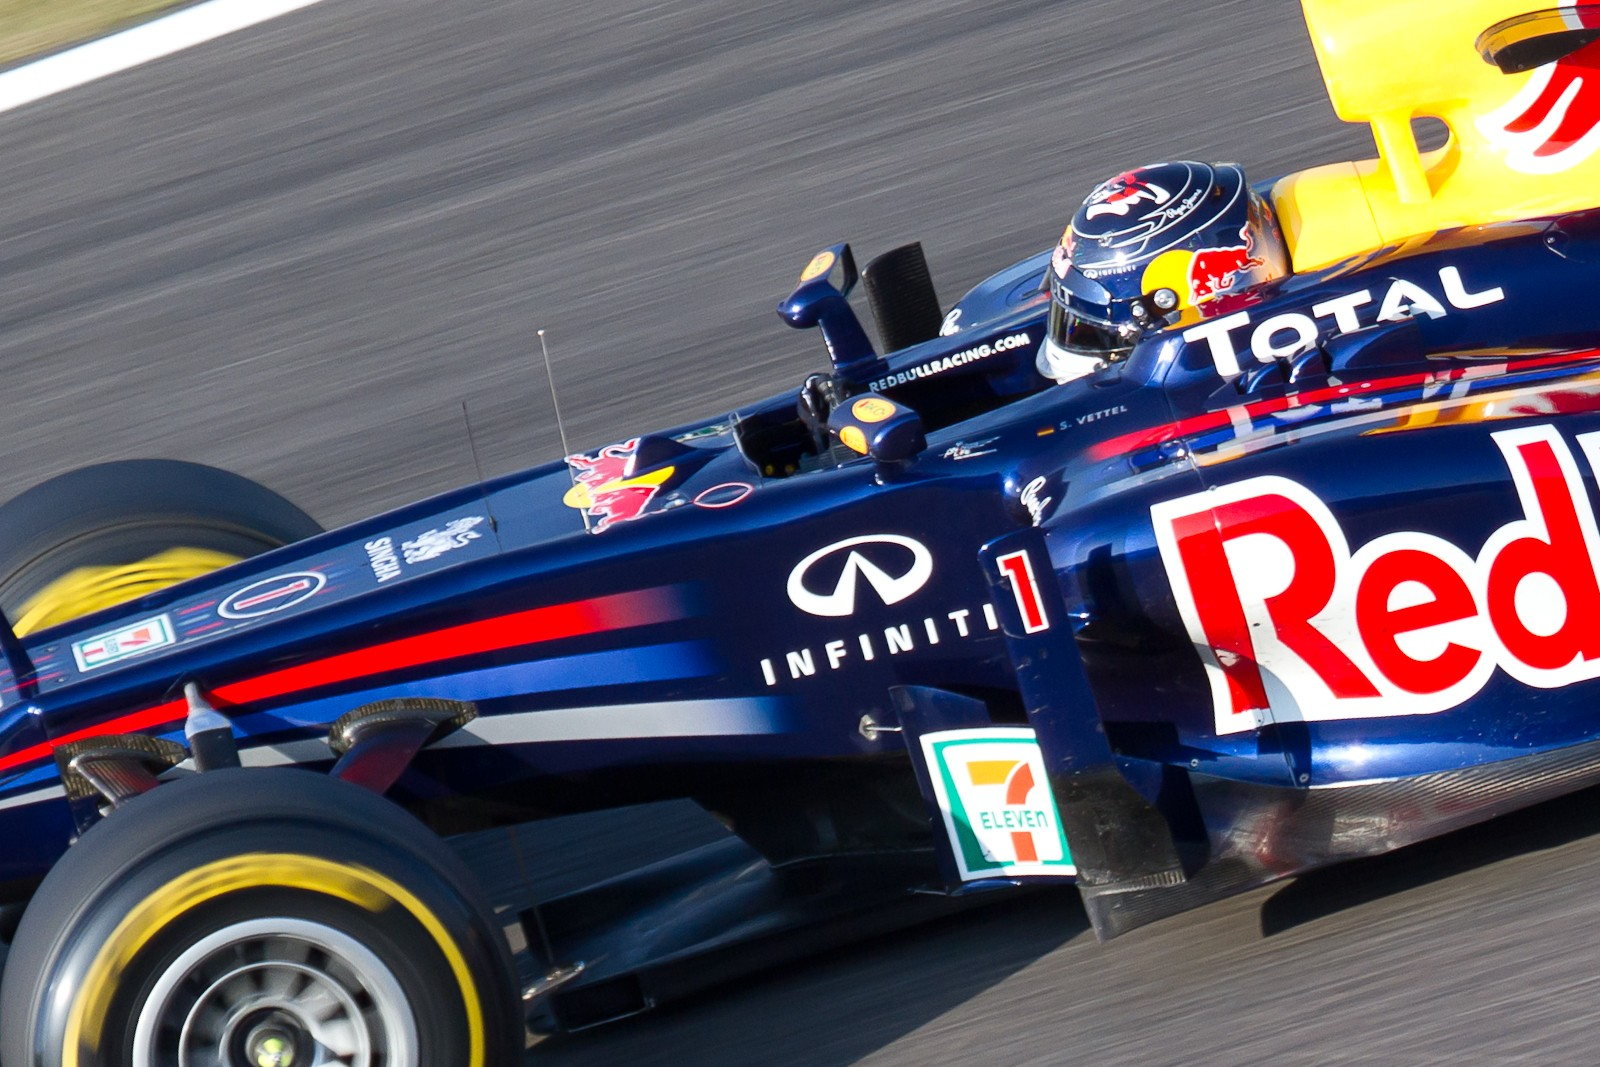 Sebastian_Vettel_2011_Japan_Race